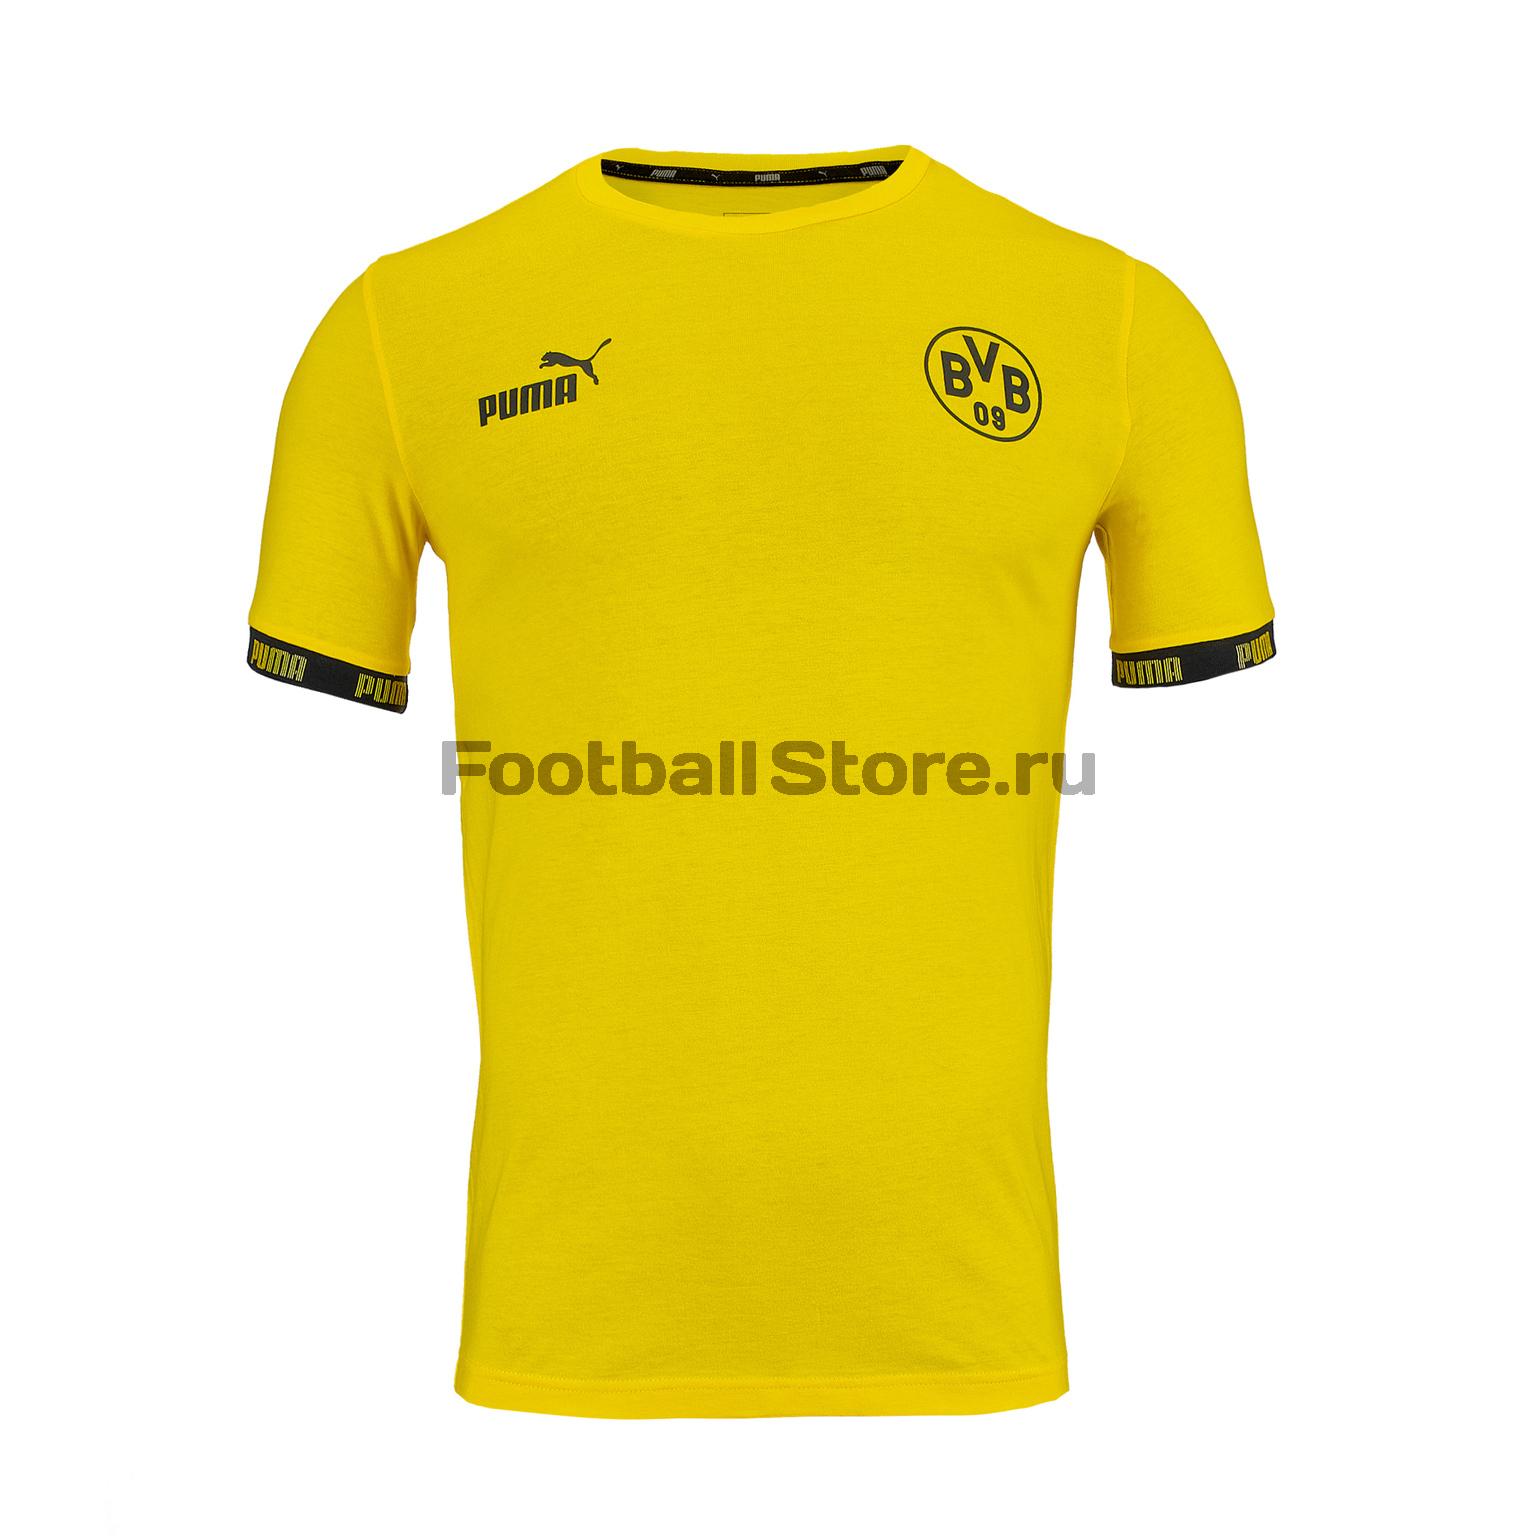 Футболка тренировочная Puma Borussia Culture Tee 75578701 цена 2017